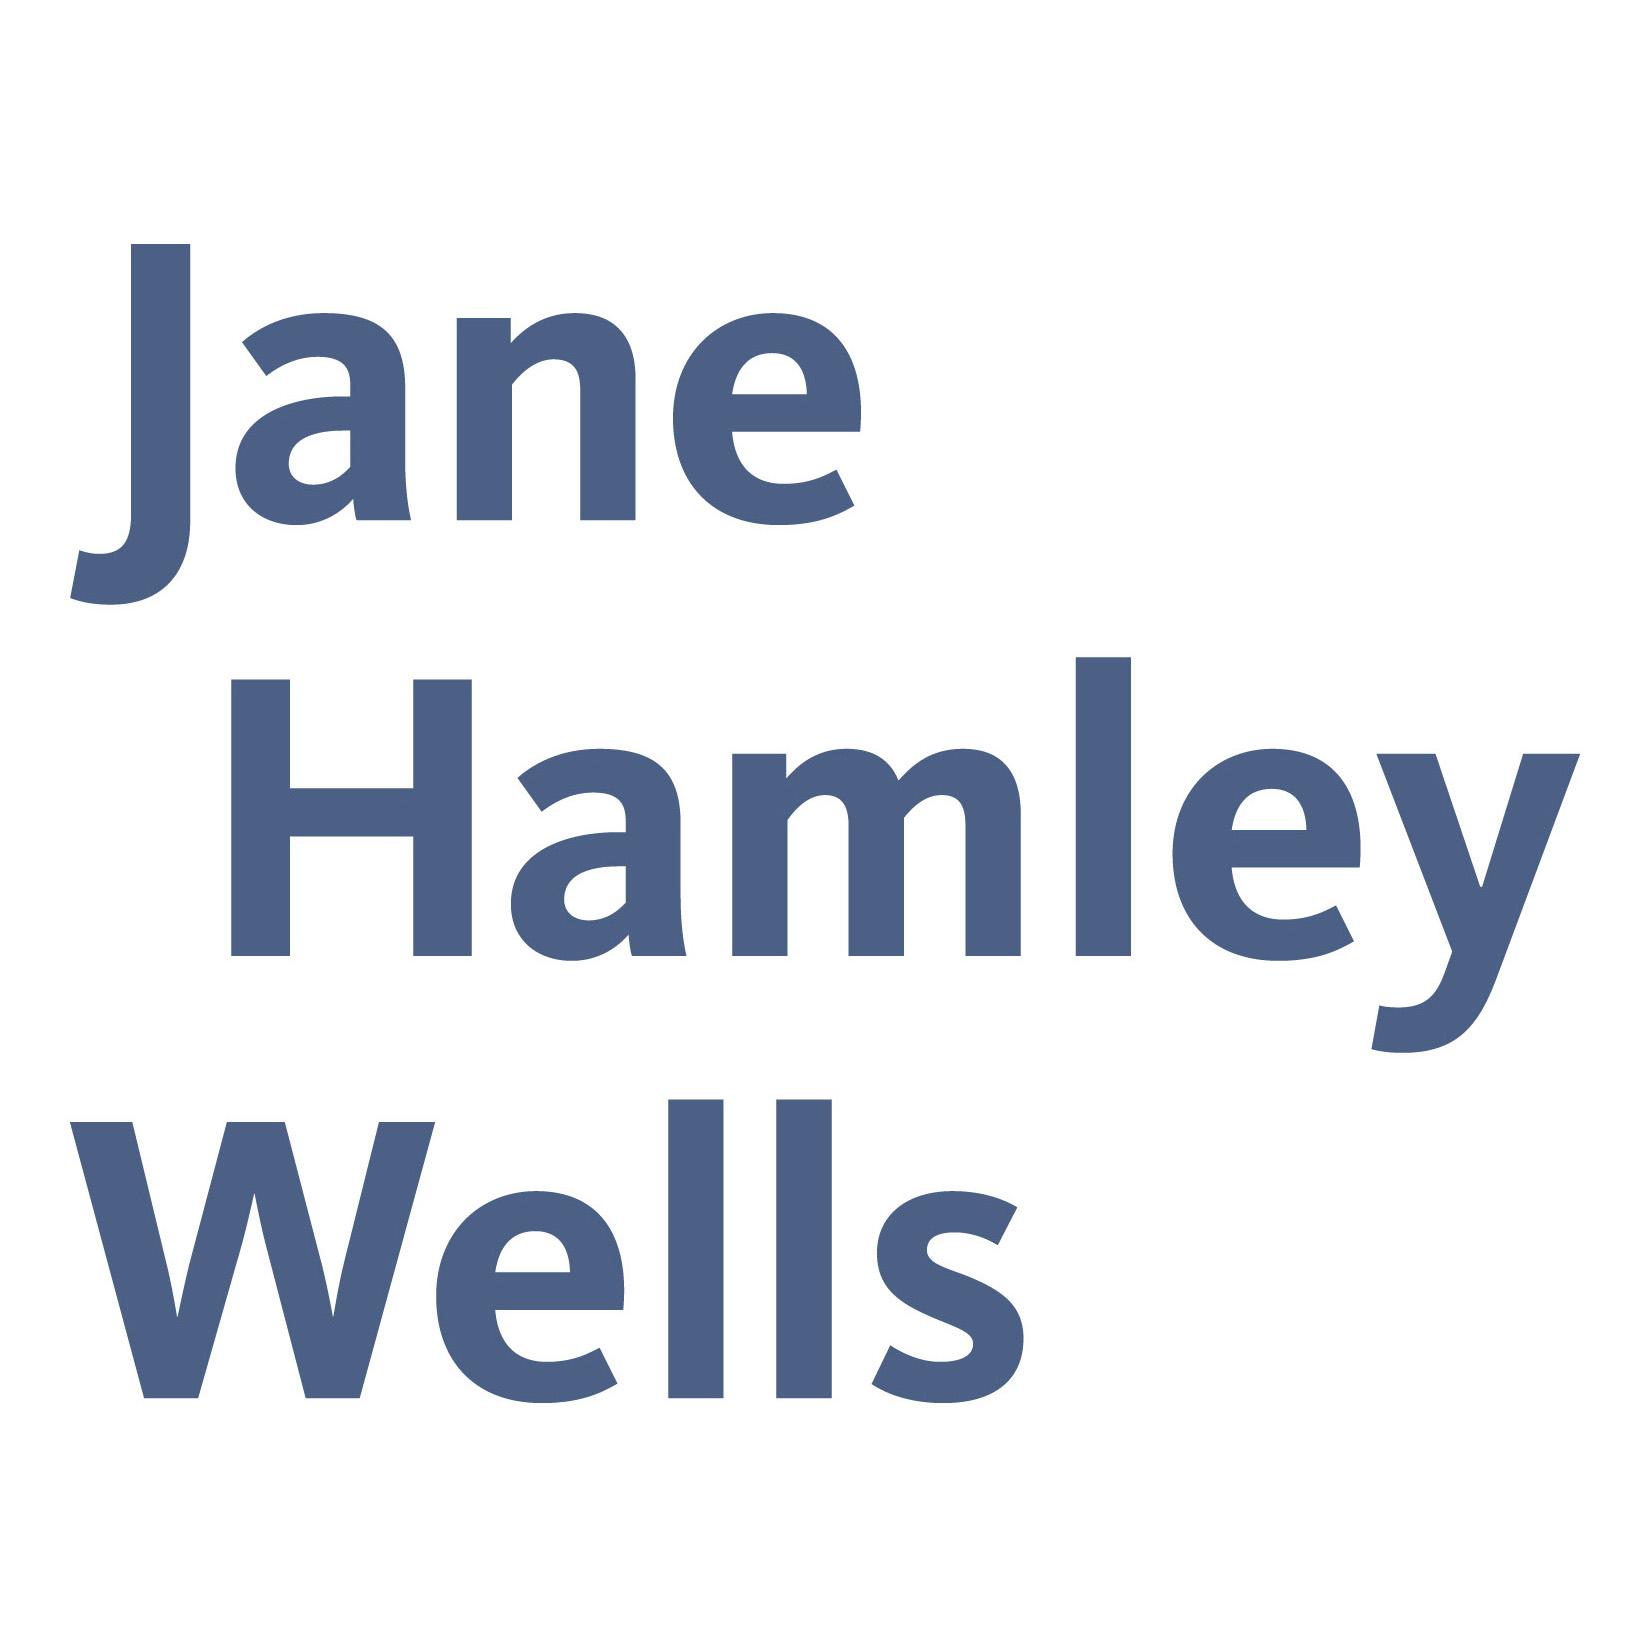 Jhw logo s s